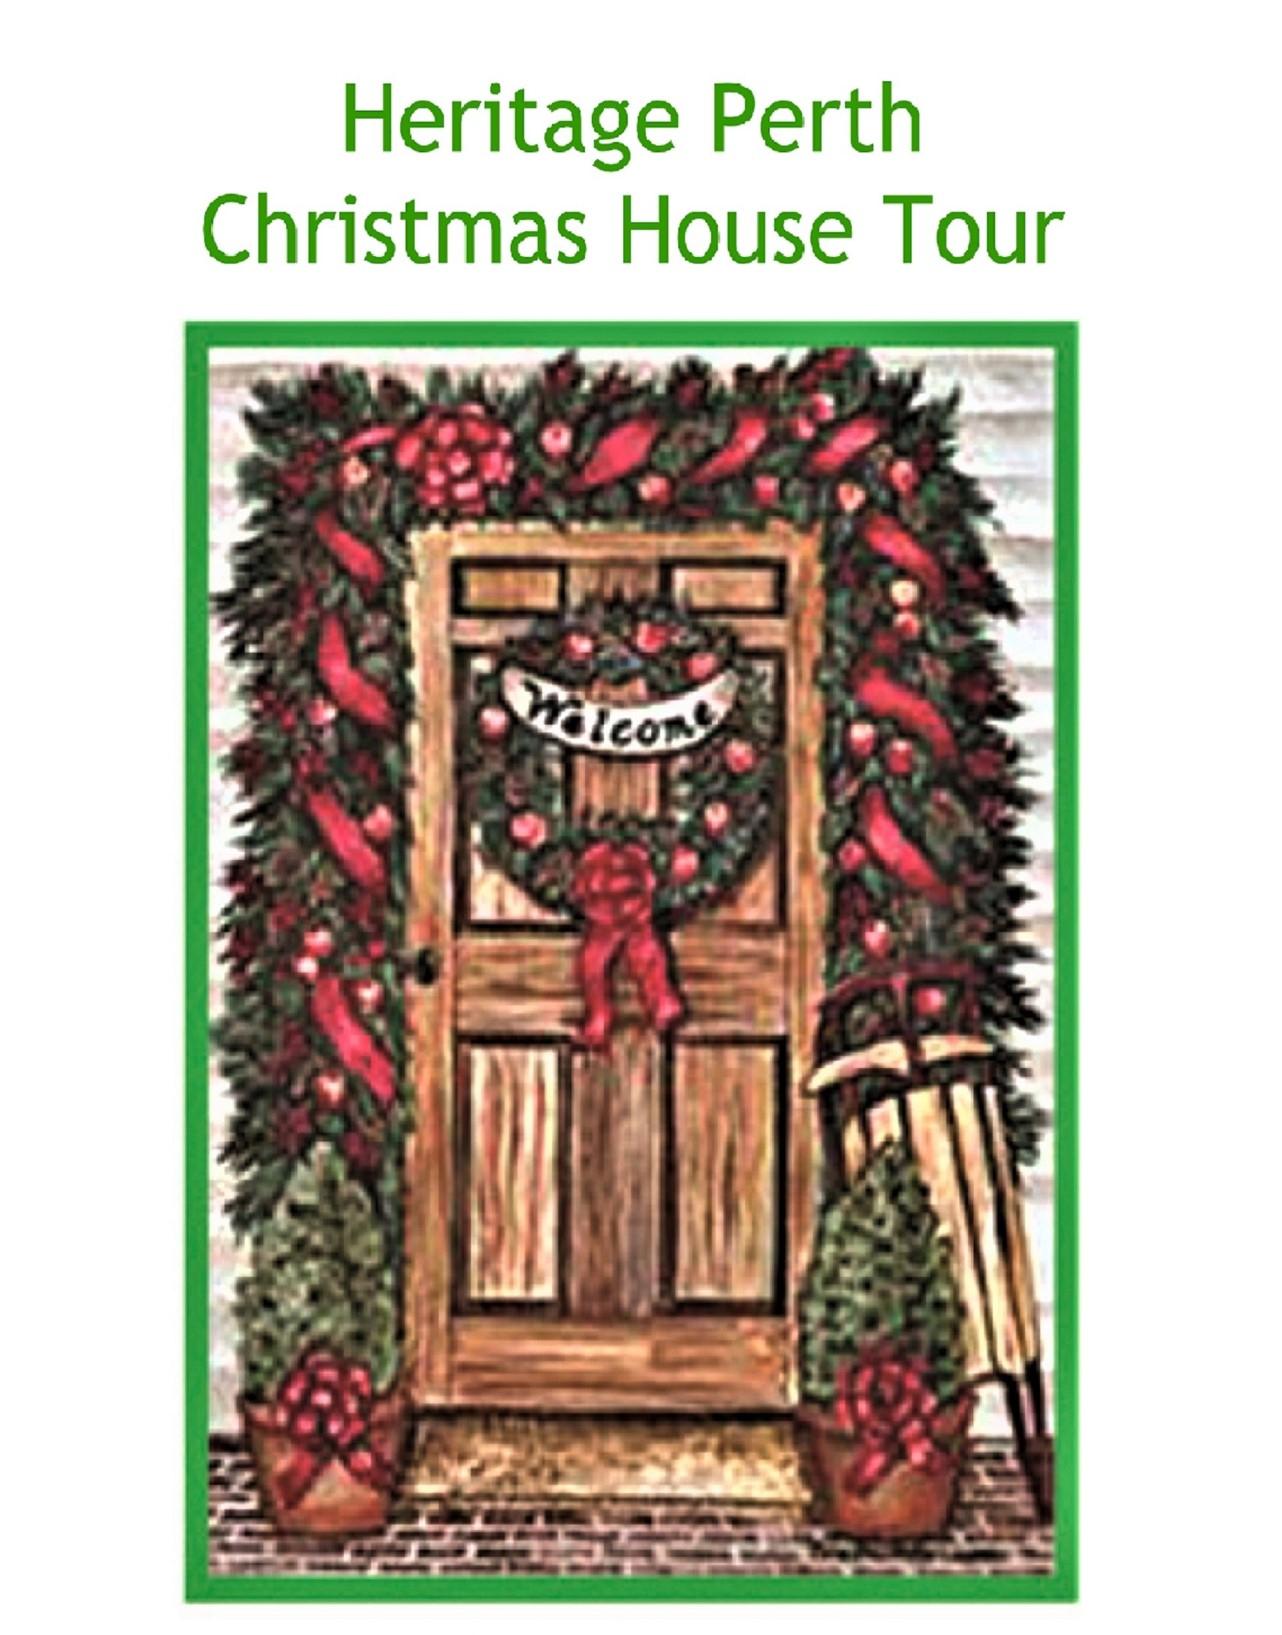 Heritage Perth Christmas House Tour - Lanark County Tourism Regarding College Of Lake County Calendar 2021